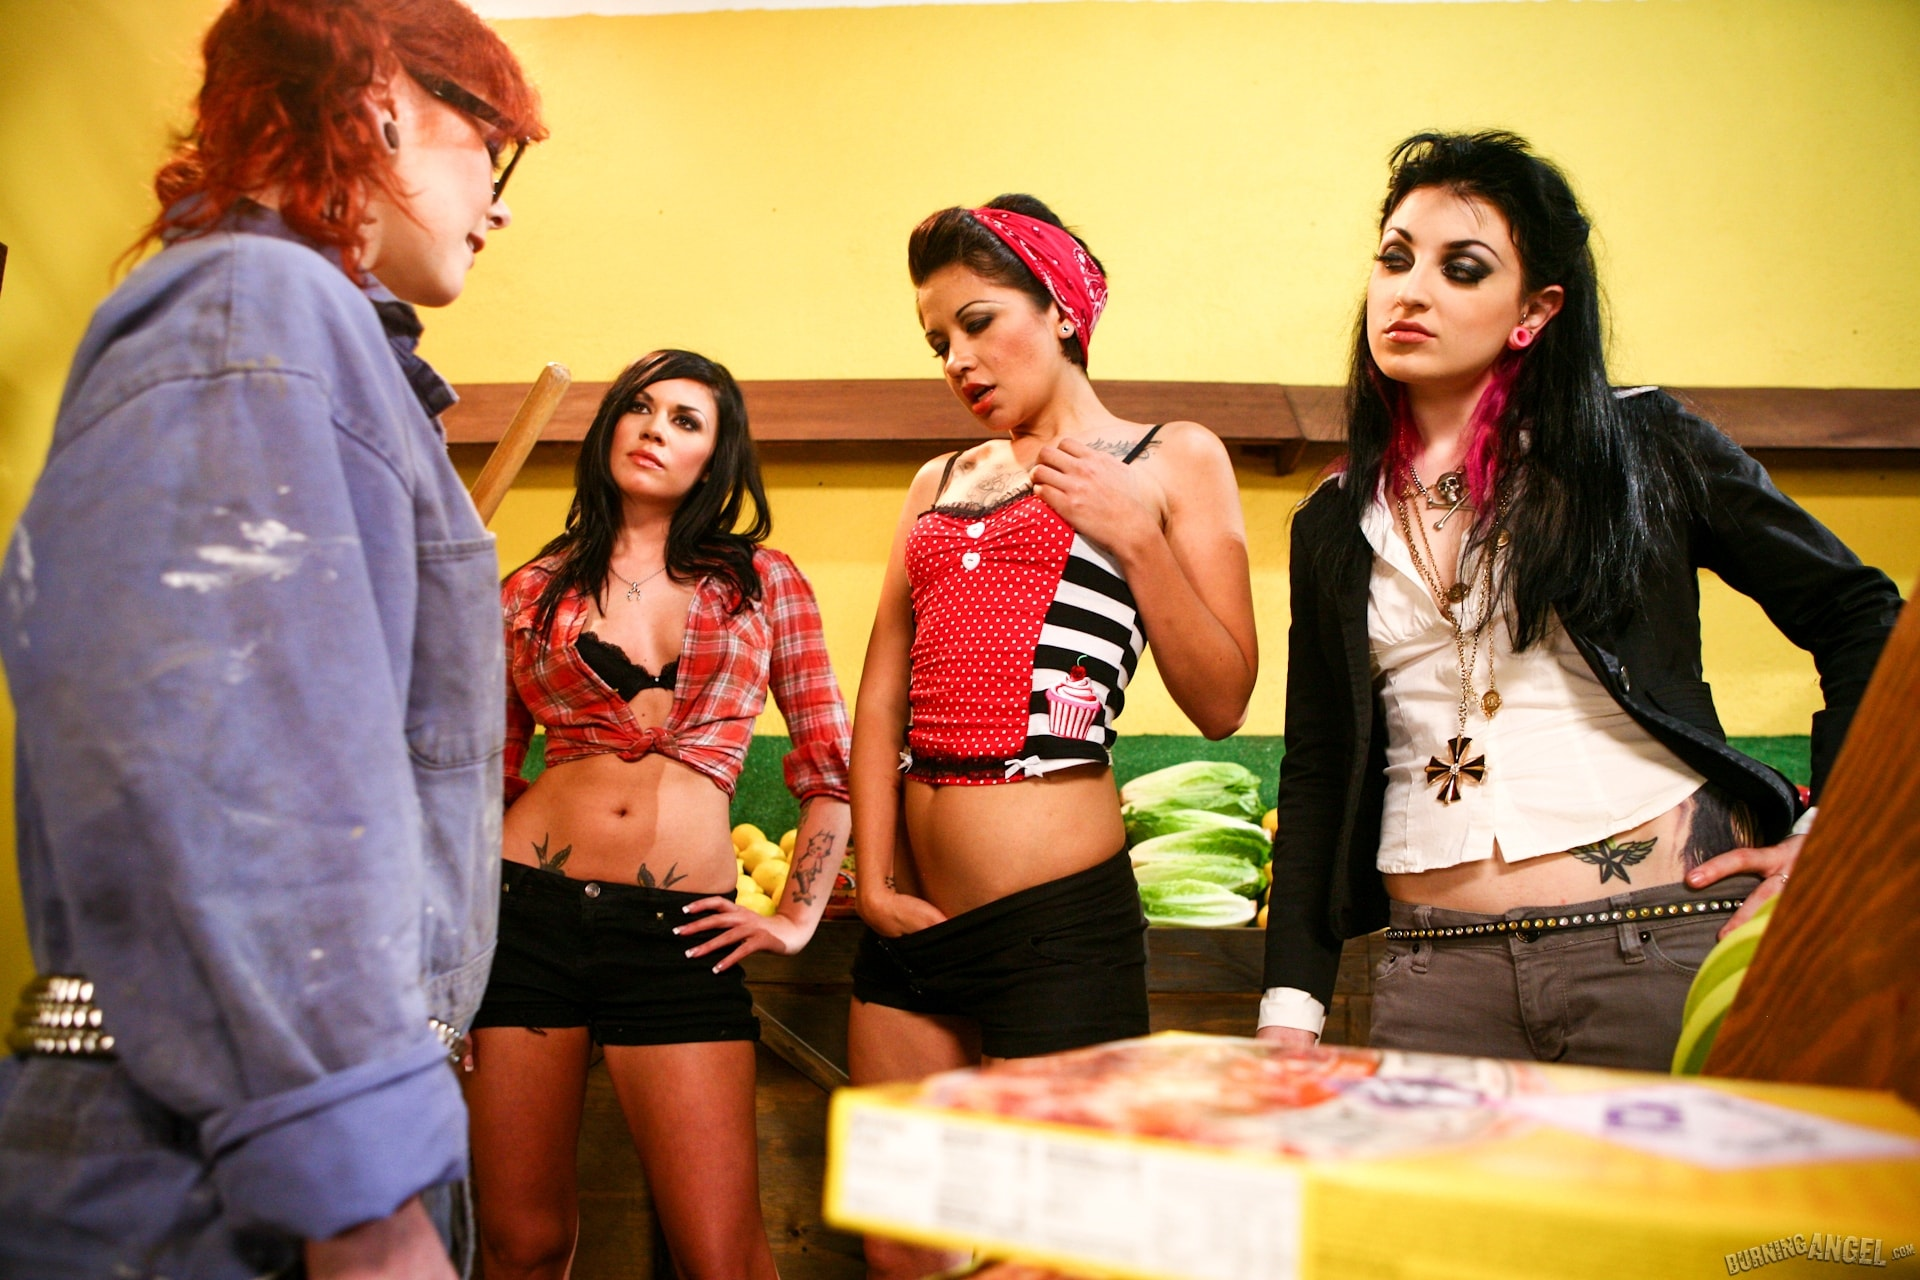 Burning Angel 'Four Girls One Mop' starring Andy San Dimas (Photo 3)